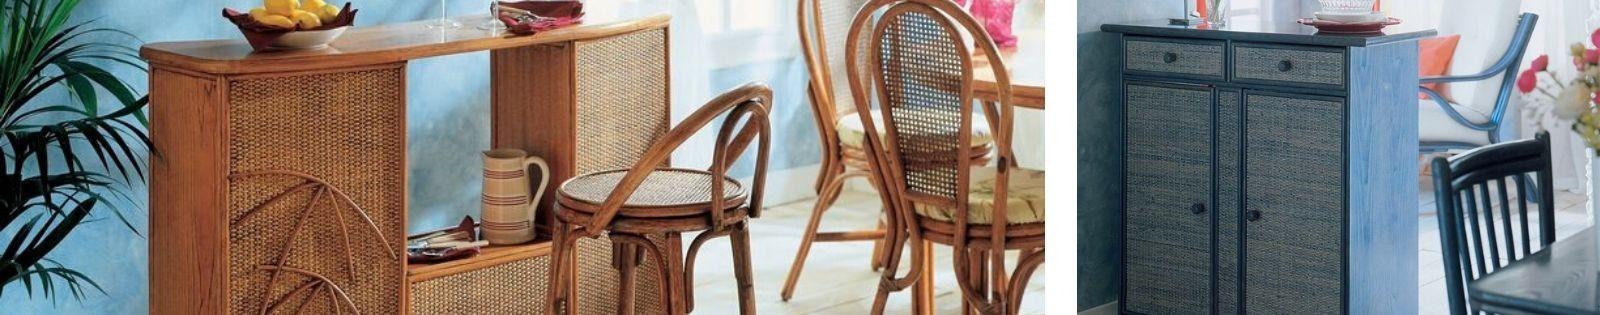 Bar Rotin : Meubles haut de gamme de fabrication artisanale. Lotuséa